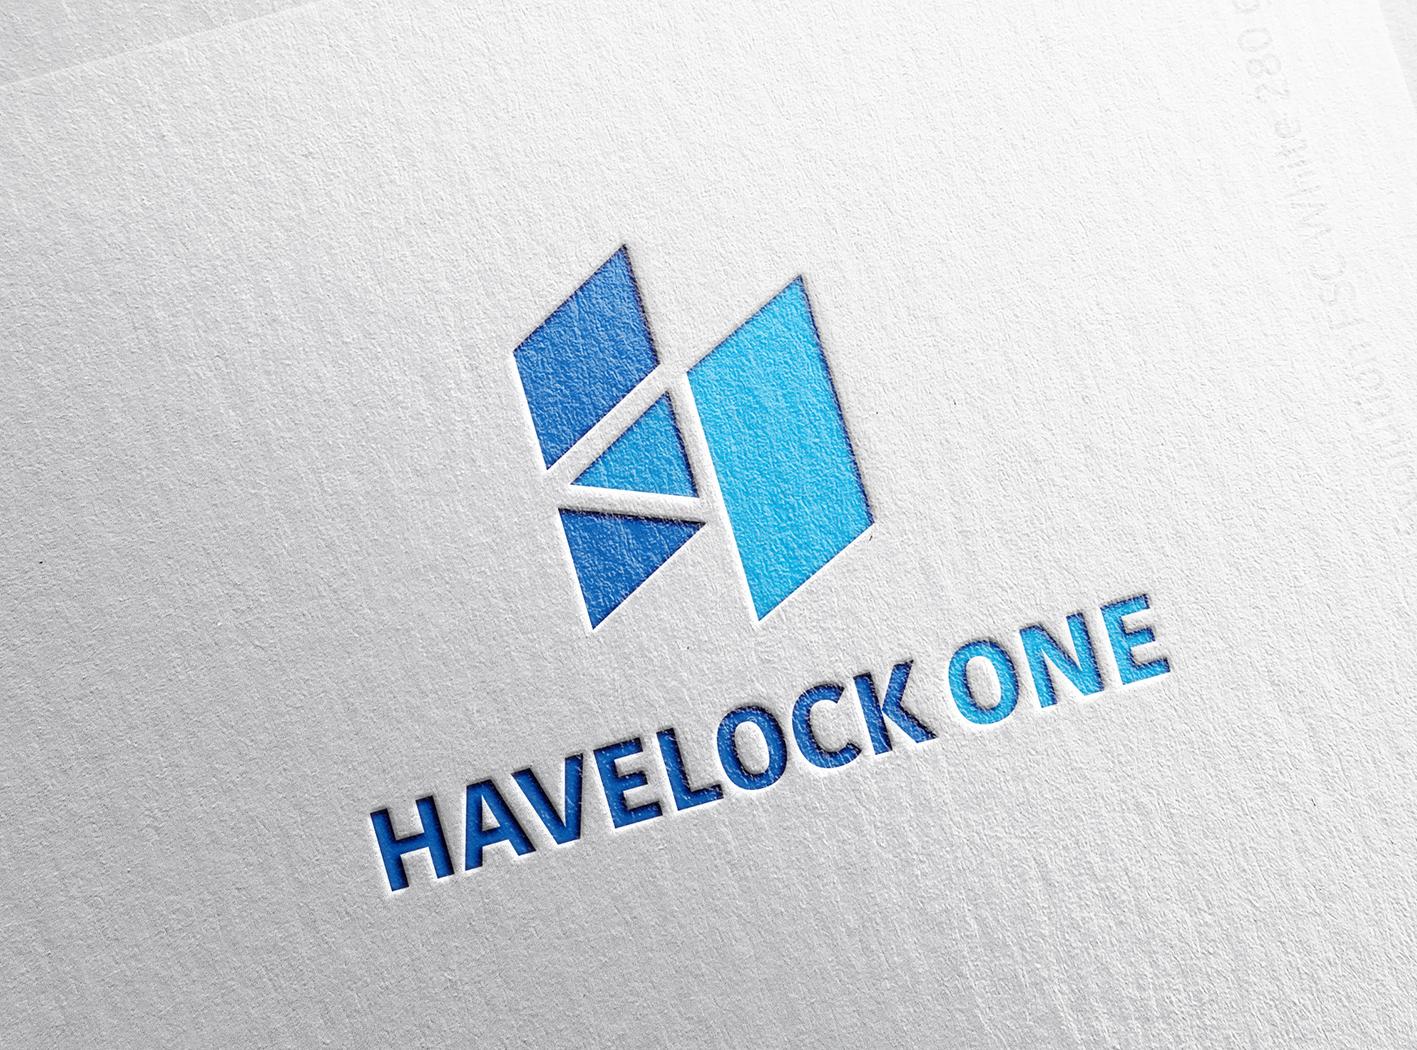 Havelock.jpg